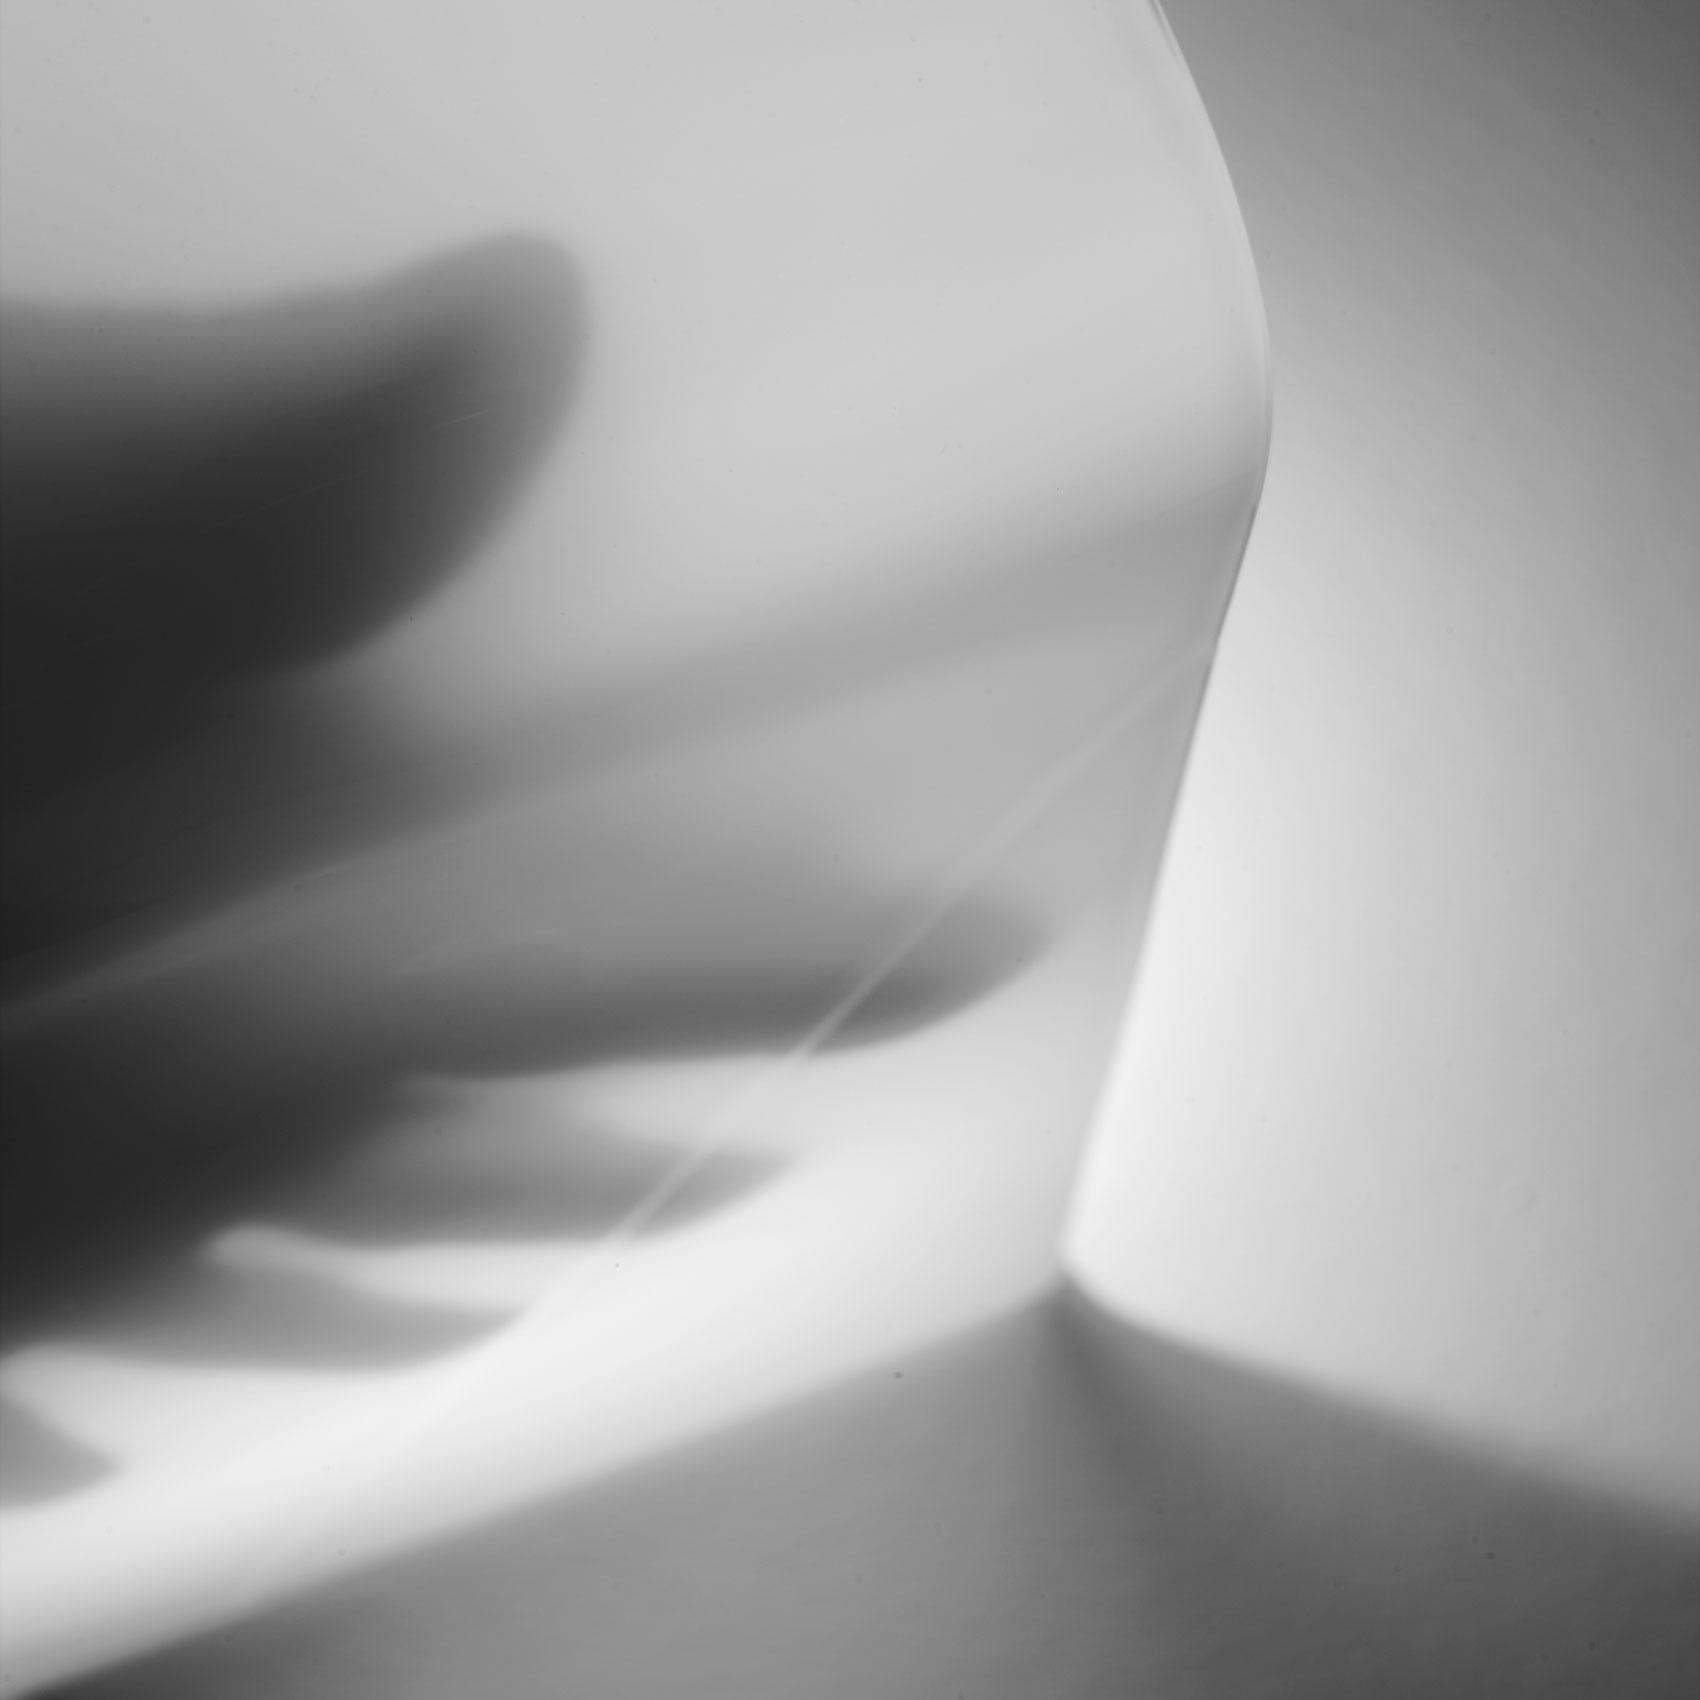 marco-zito-steelon-04